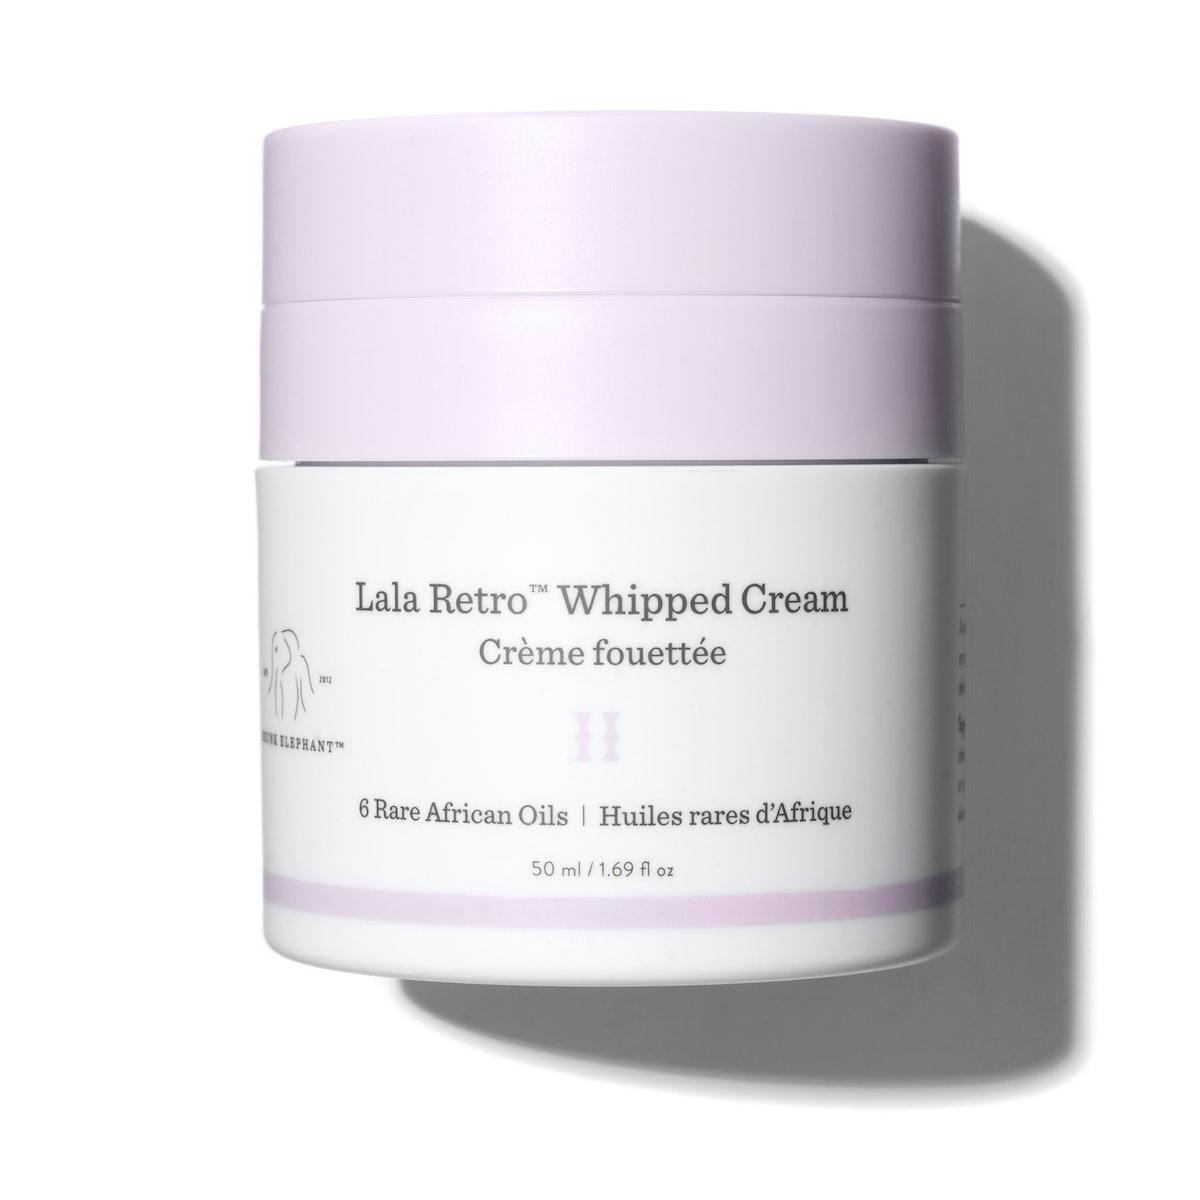 Lala Retro Whipped Cream